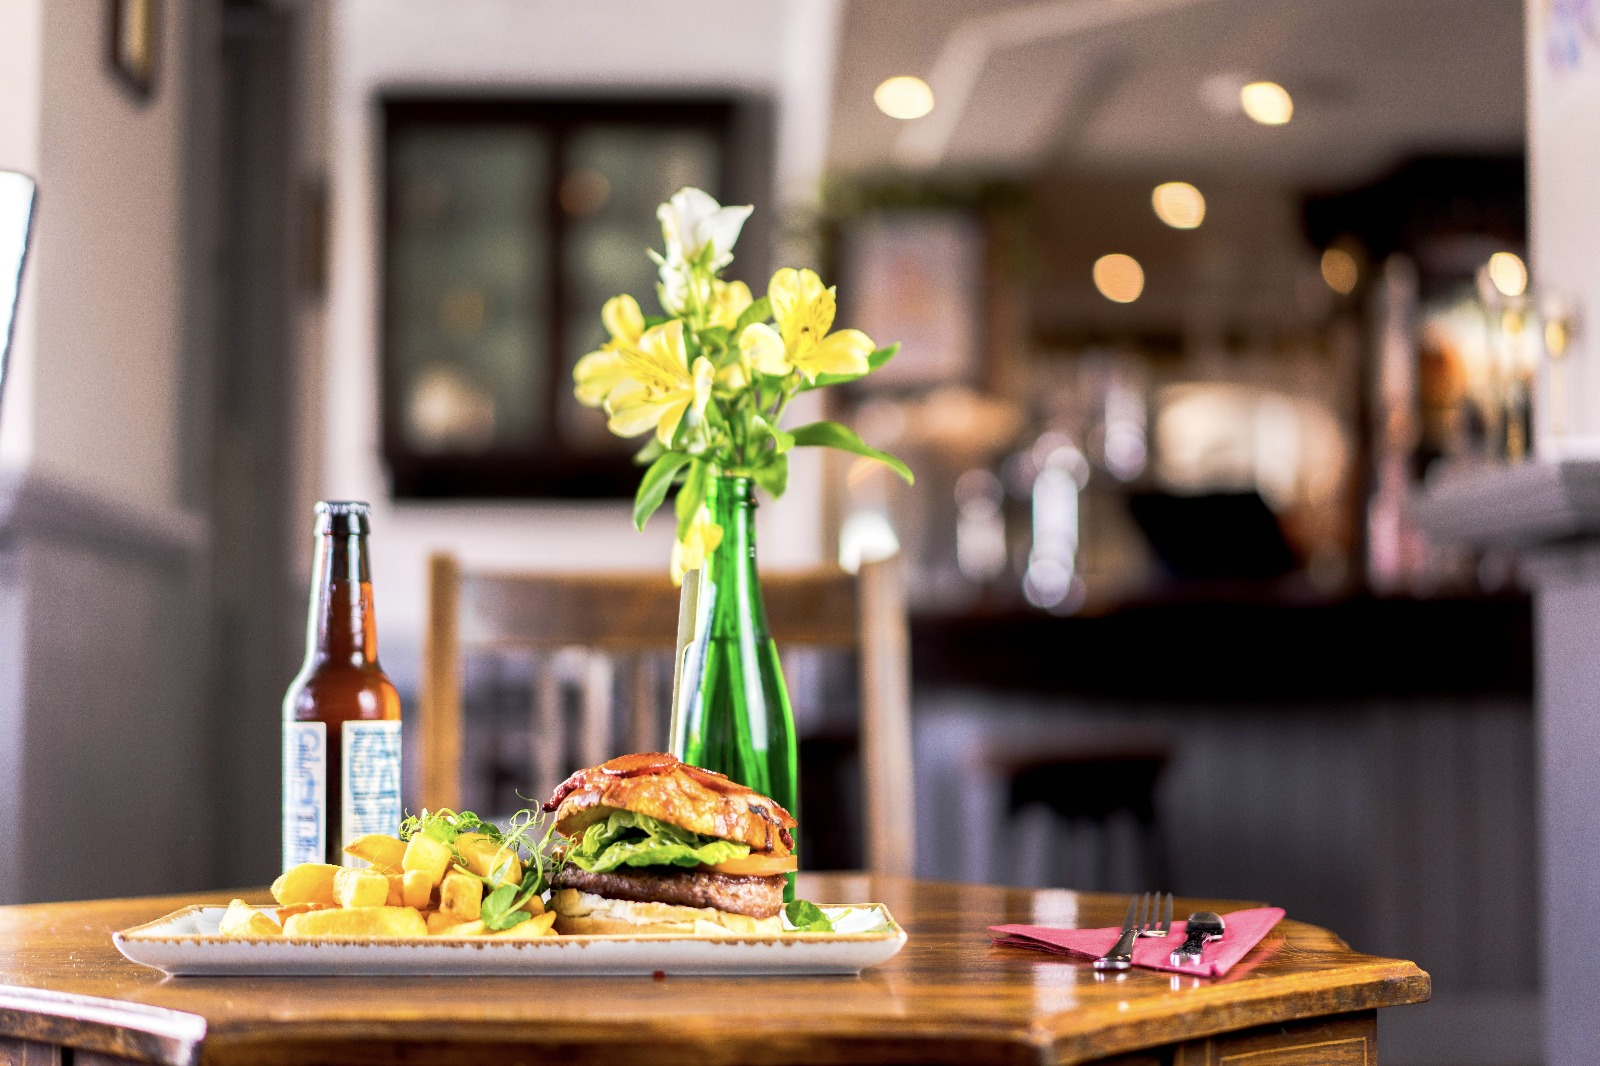 burger and beer image.JPG